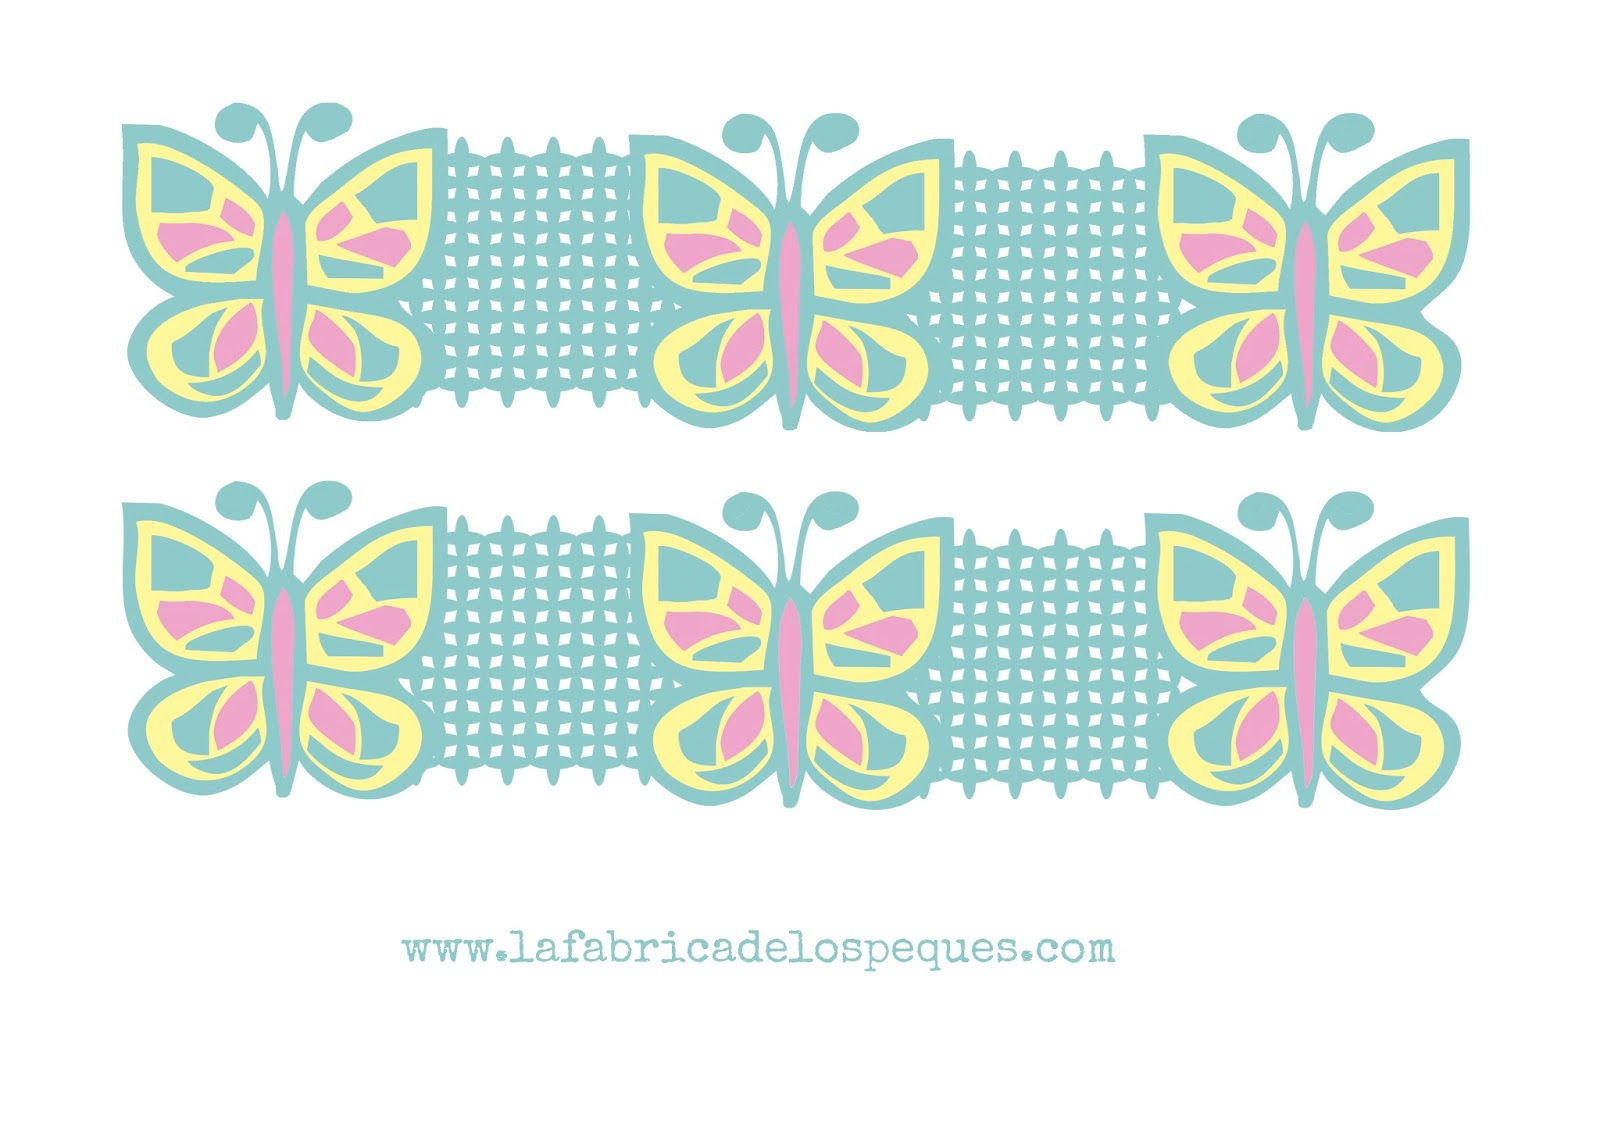 Imprimibles y moldes gratis: cenefas infantiles para decorar